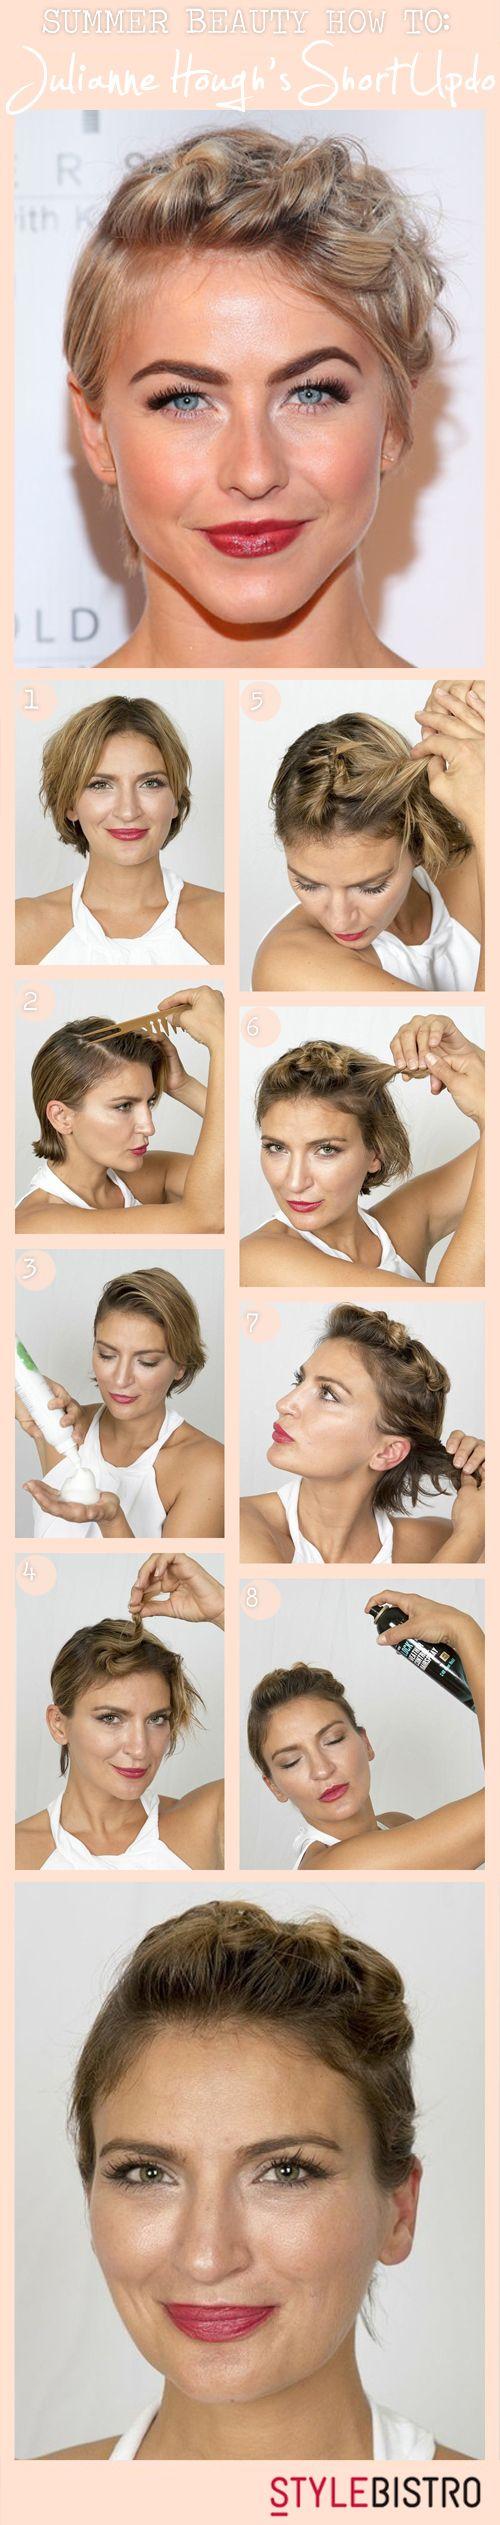 Summer beauty how to julianne houghus short hair updo short hair